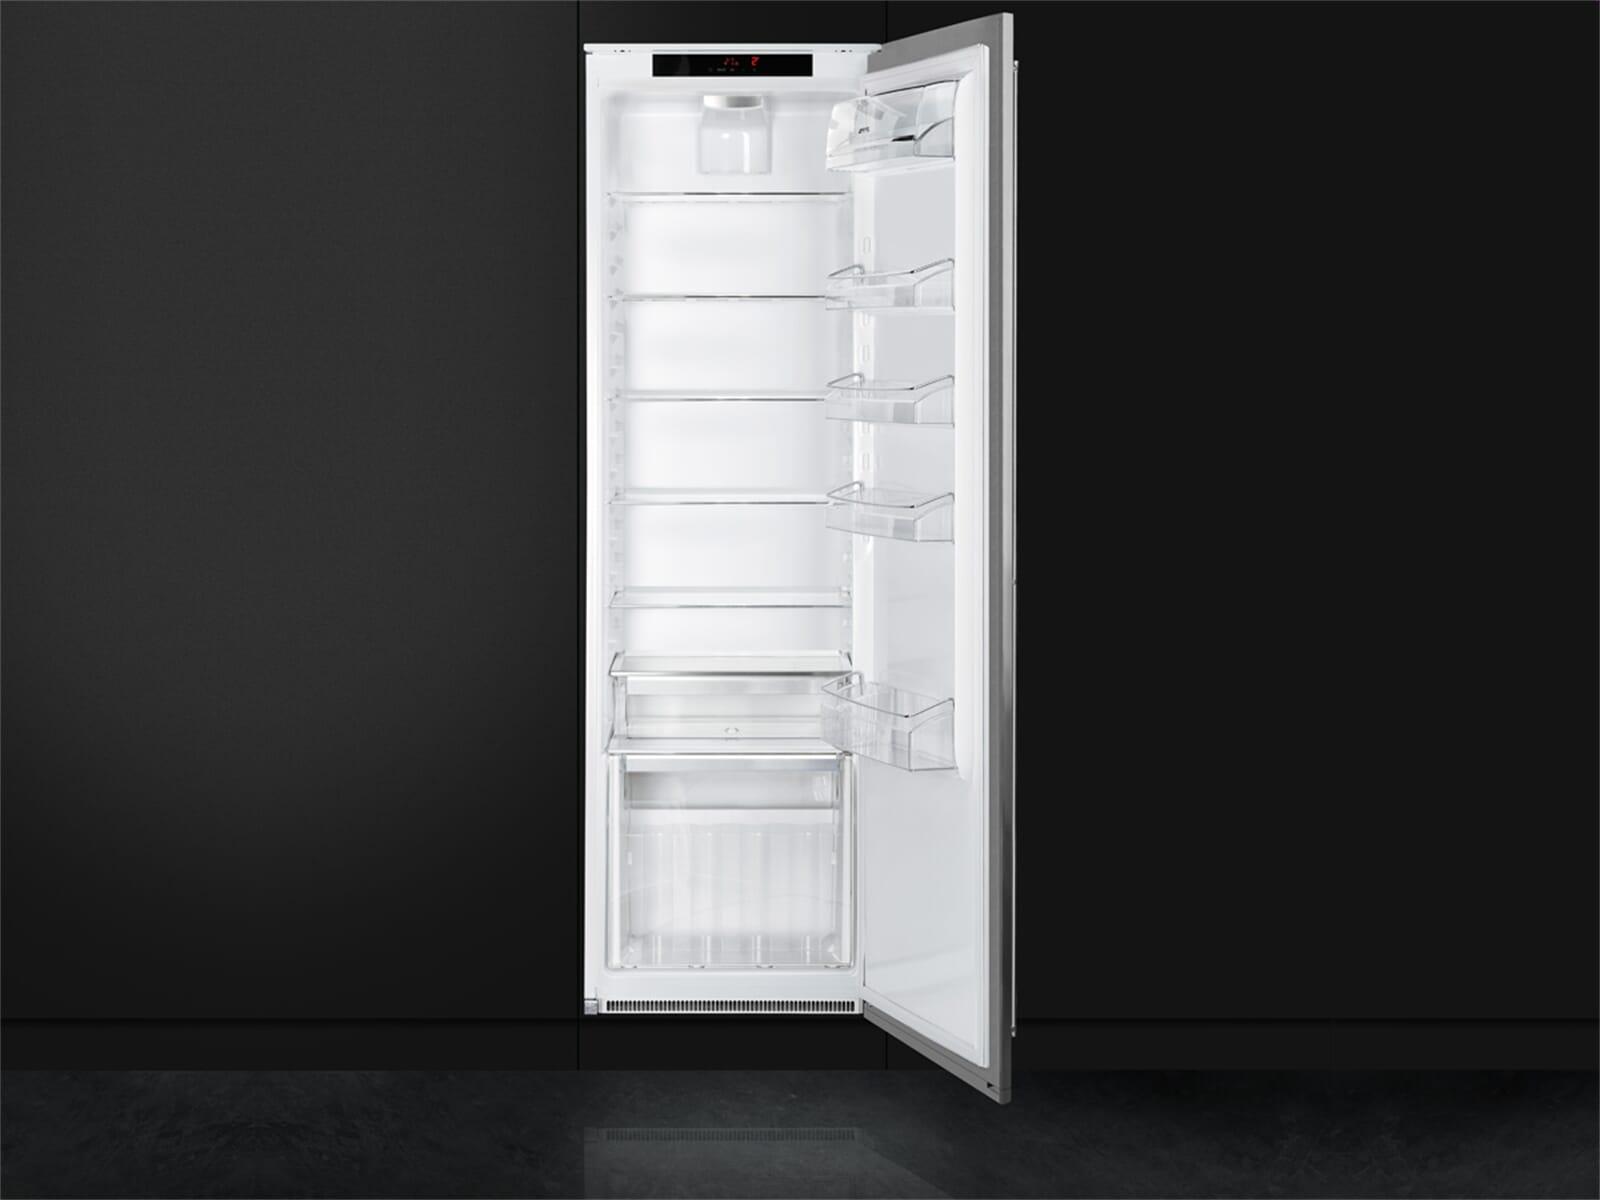 Bosch Kühlschrank Urlaubsmodus : Smeg ri360rx einbaukühlschrank edelstahl